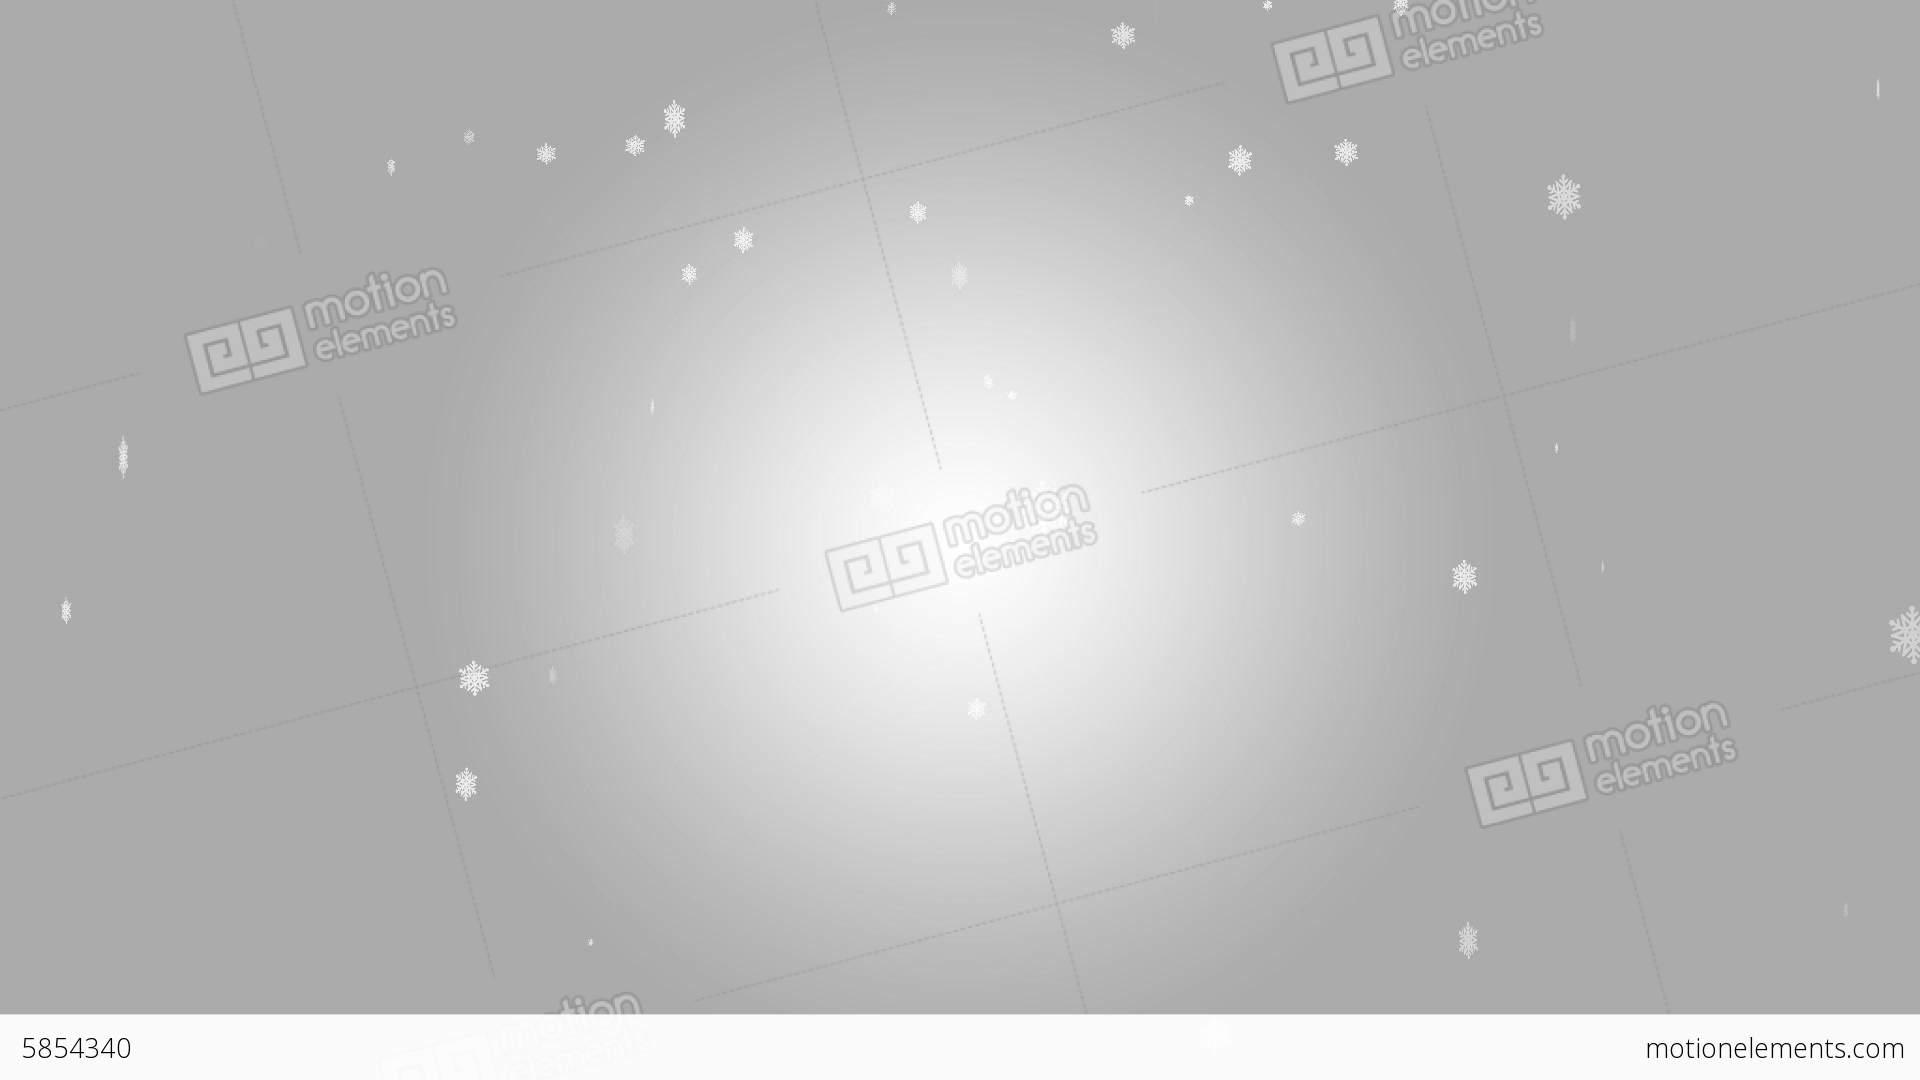 Seasons greetings banner with christmas illustrations stock seasons greetings banner with christmas illustrations stock video footage kristyandbryce Choice Image